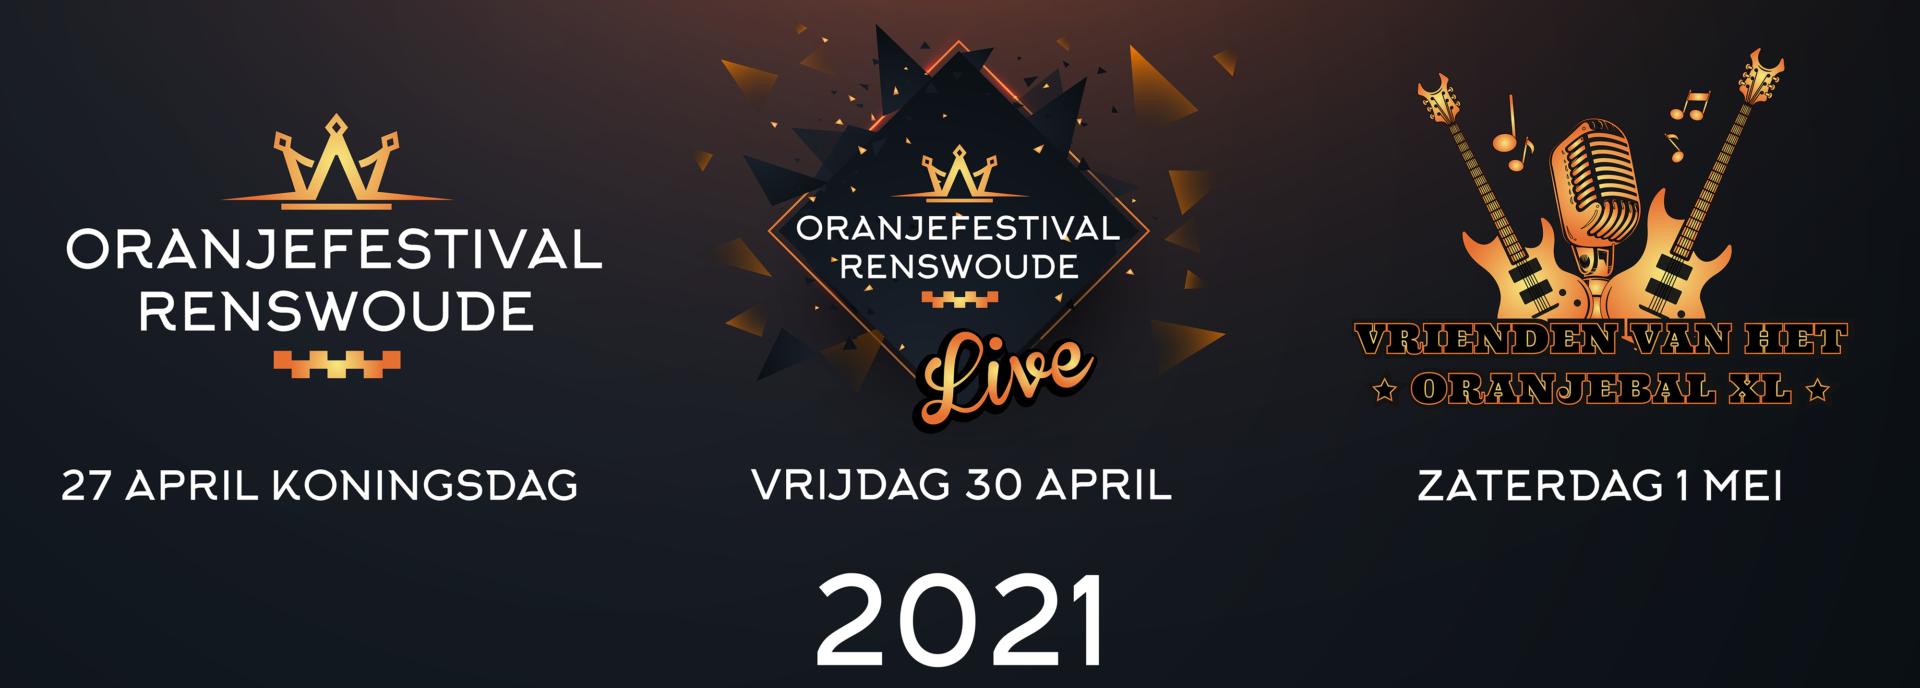 Oranjefestival Renswoude